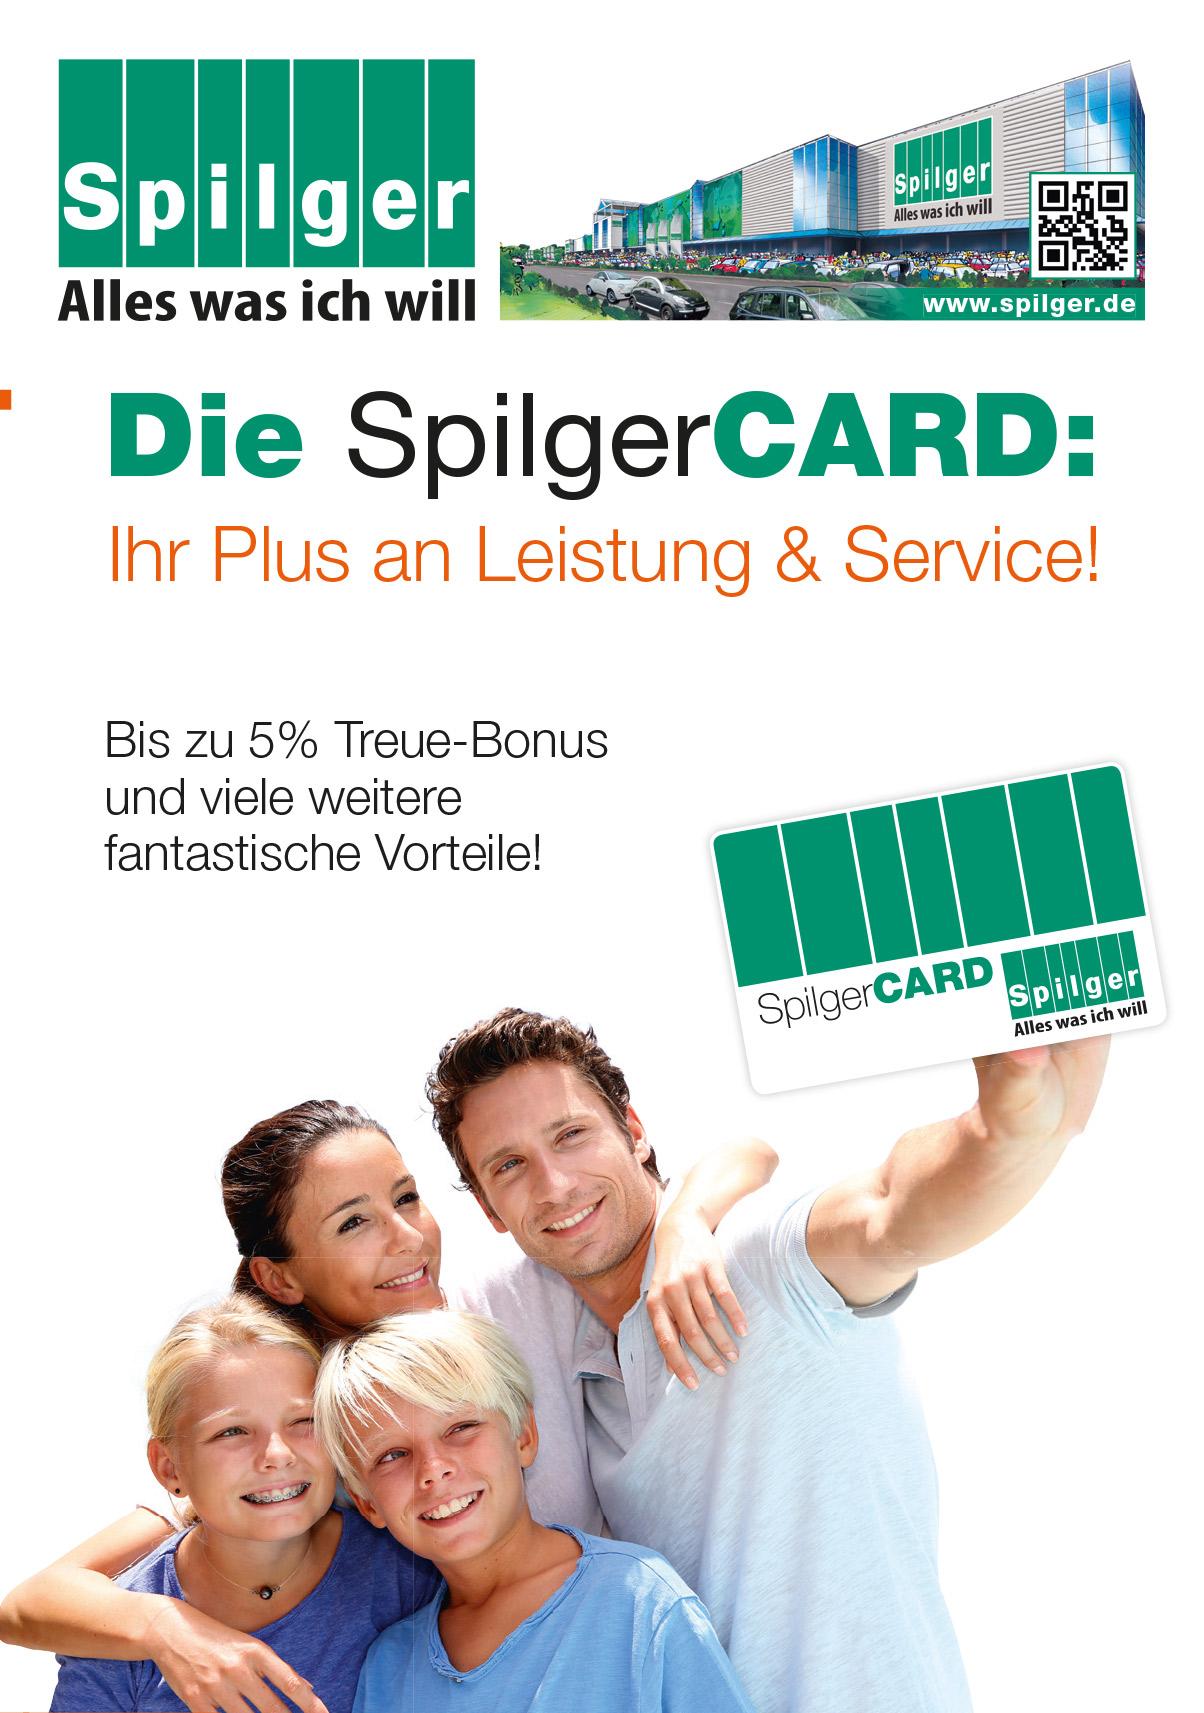 Kundenkarte Spilger Card Sparmaxx Möbelhäuser Spilgers Sparmaxx